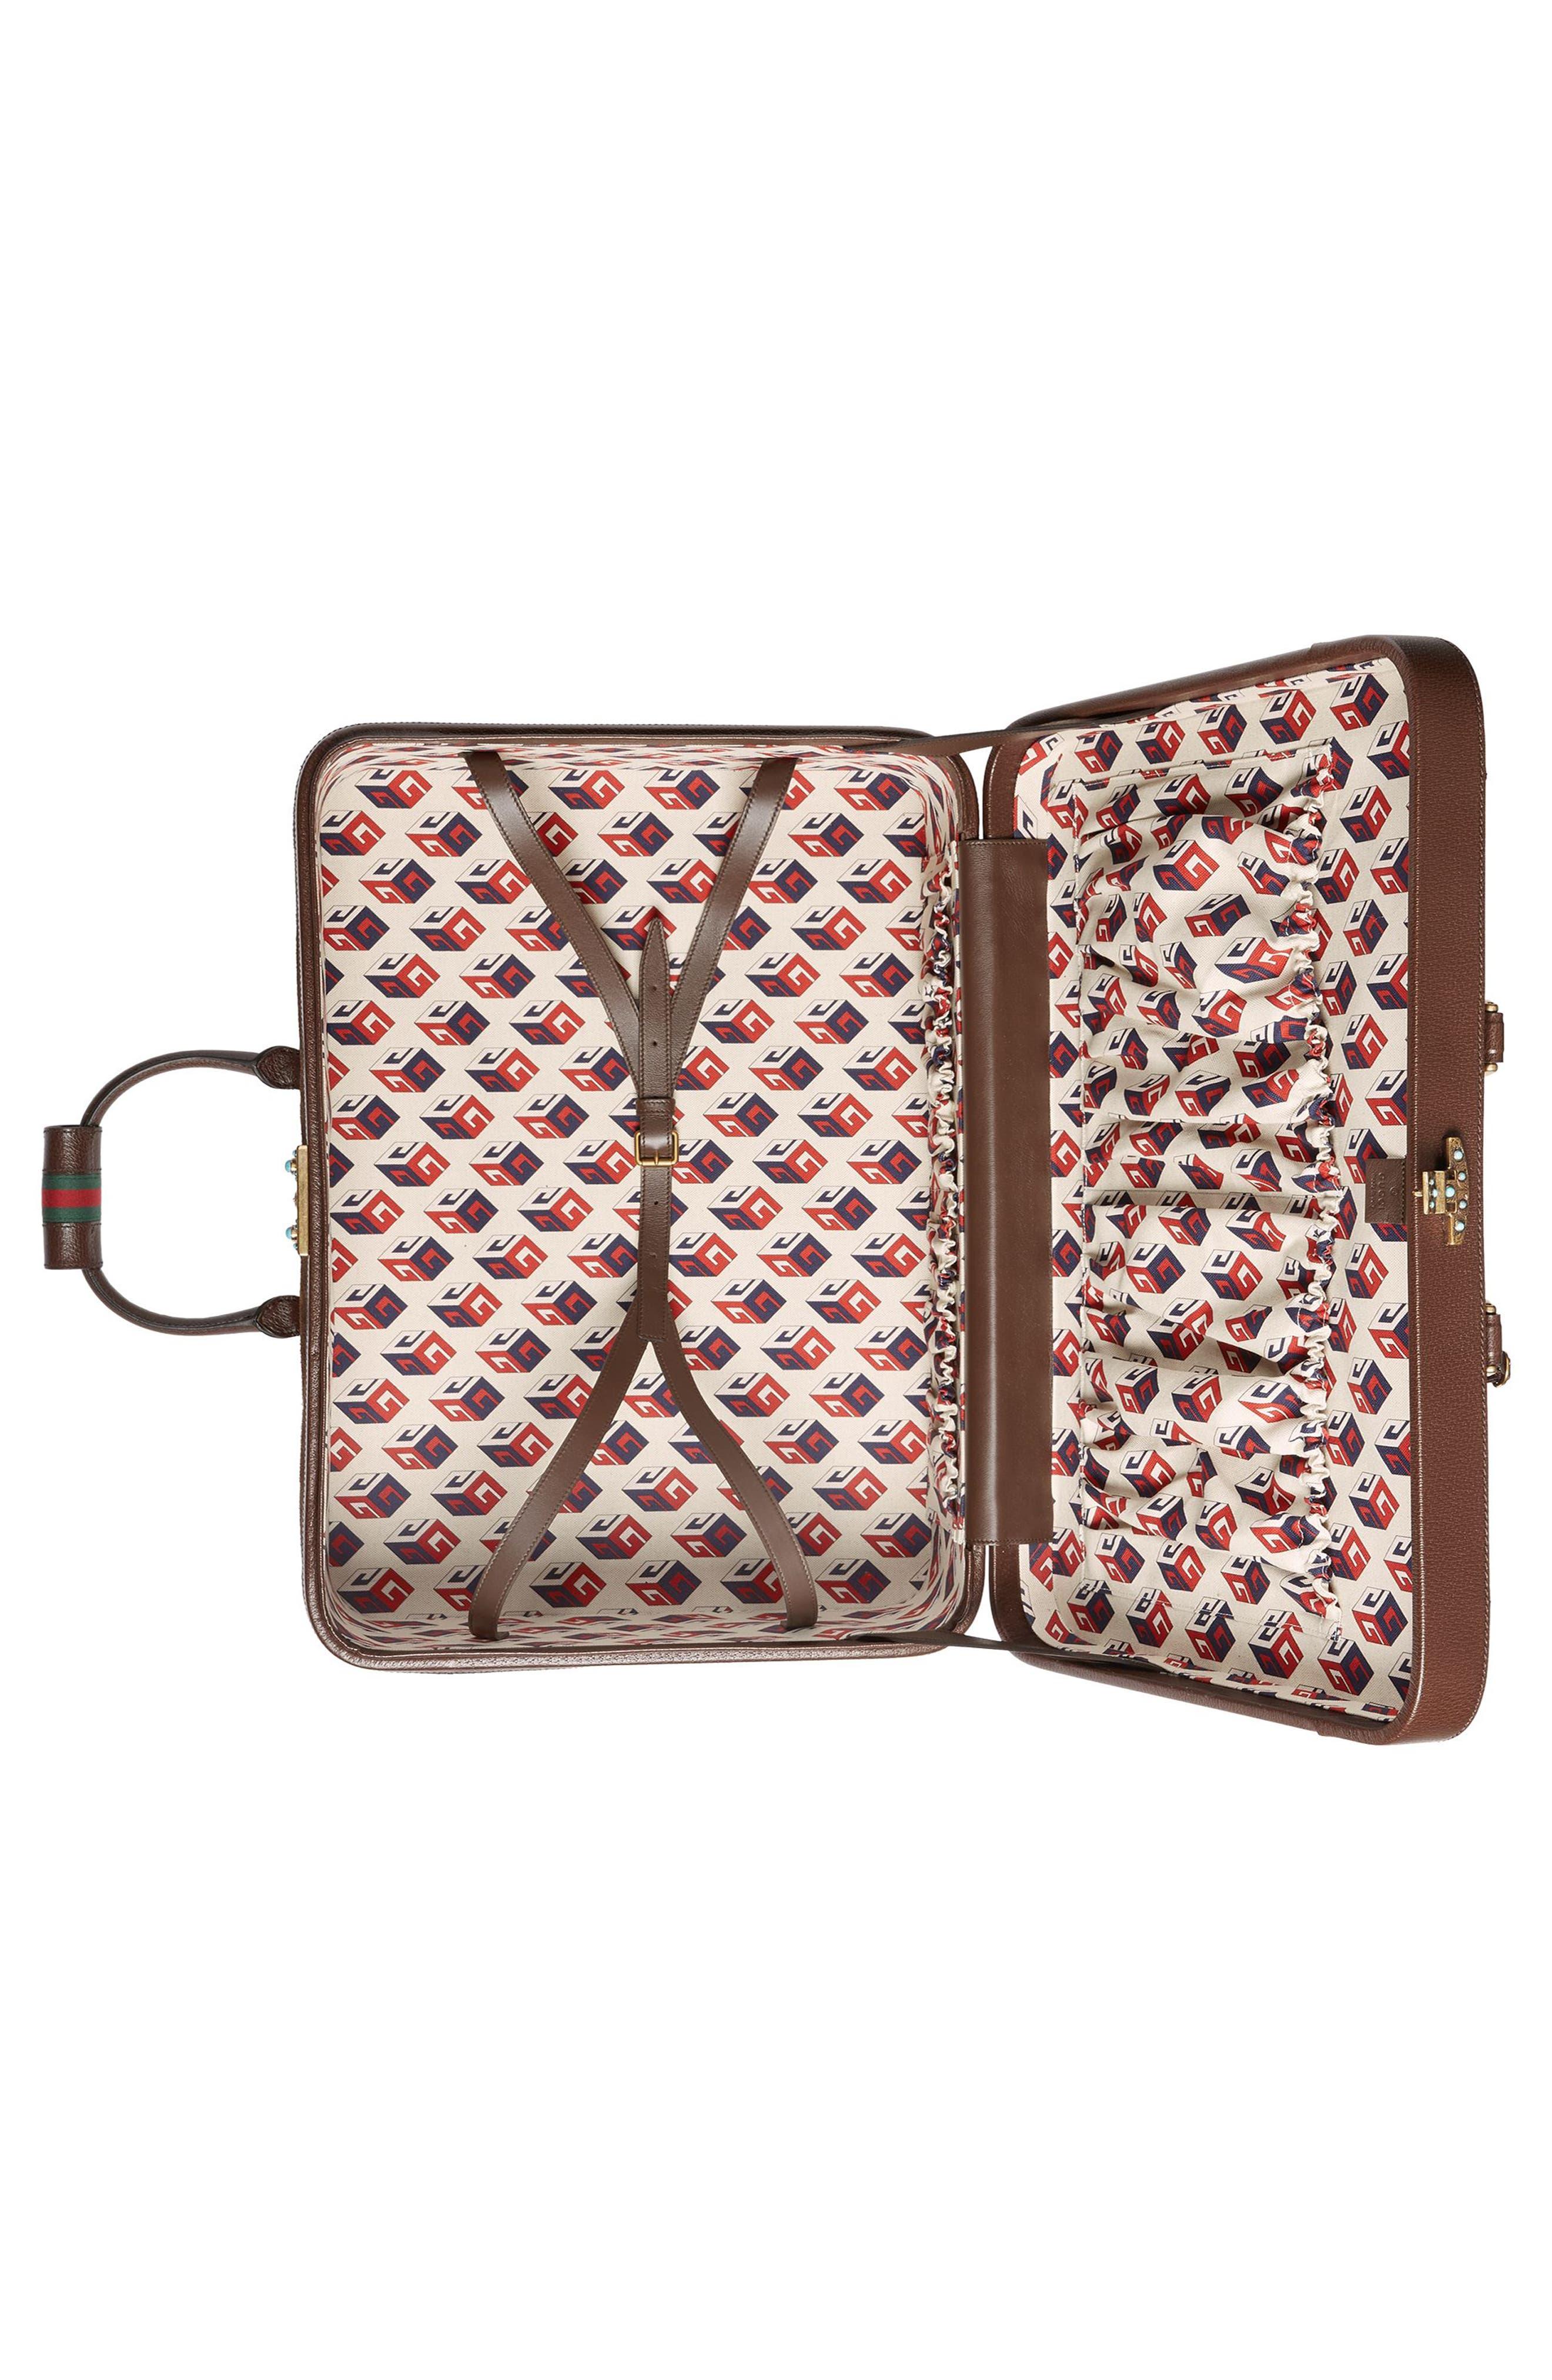 Large Echo GG Supreme Canvas & Leather Suitcase,                             Alternate thumbnail 3, color,                             283